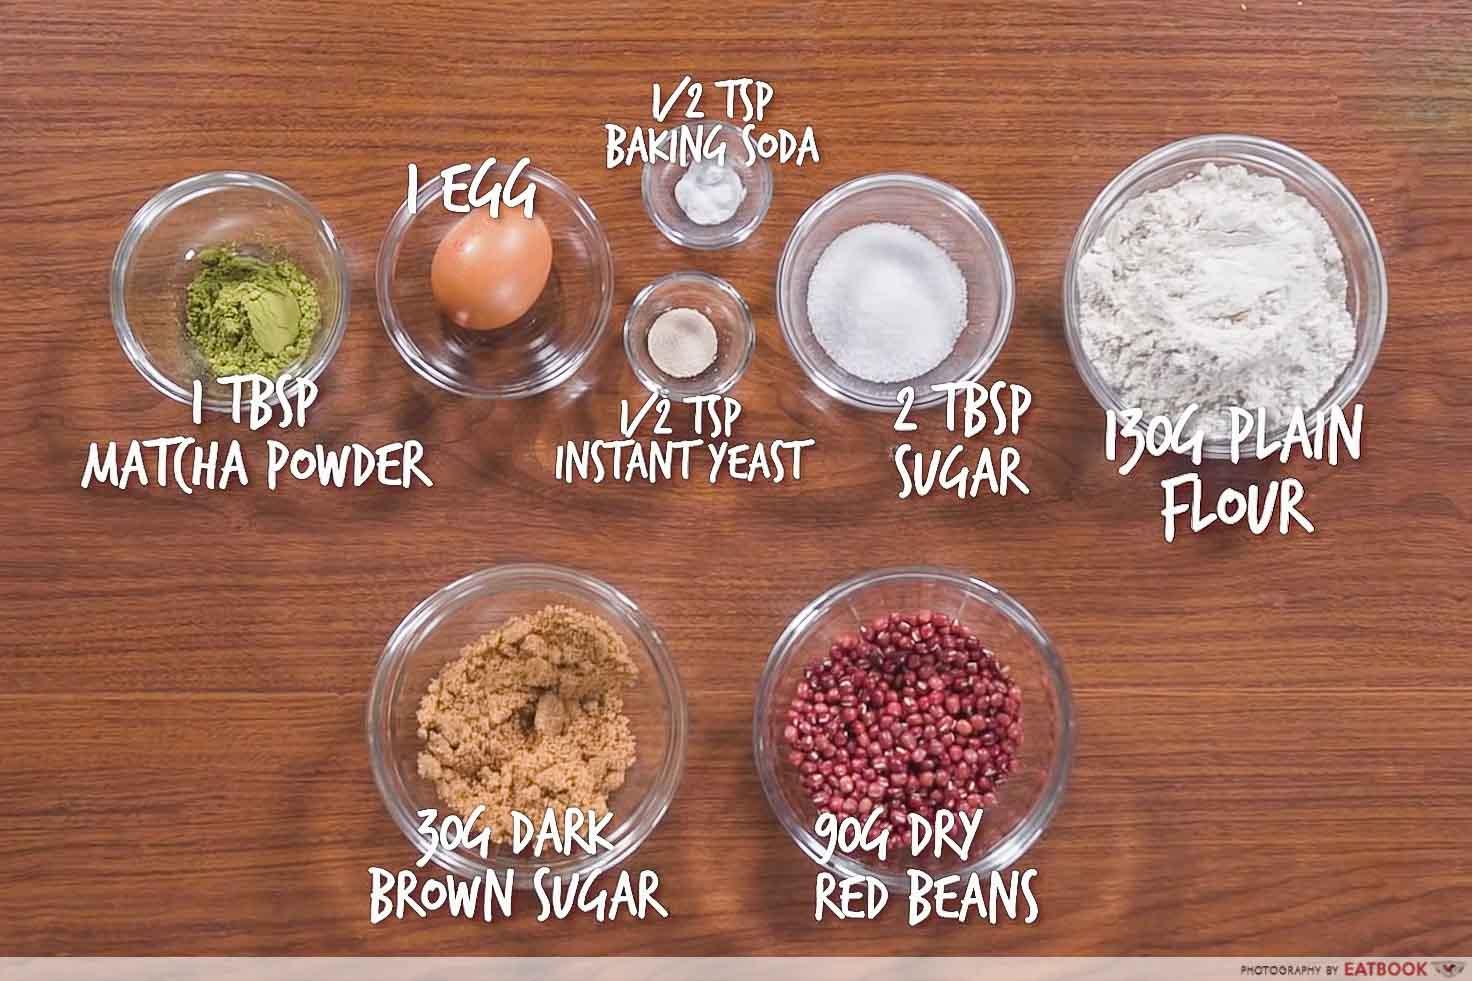 IG-worthy min jiang kueh - red bean mjk ingredients